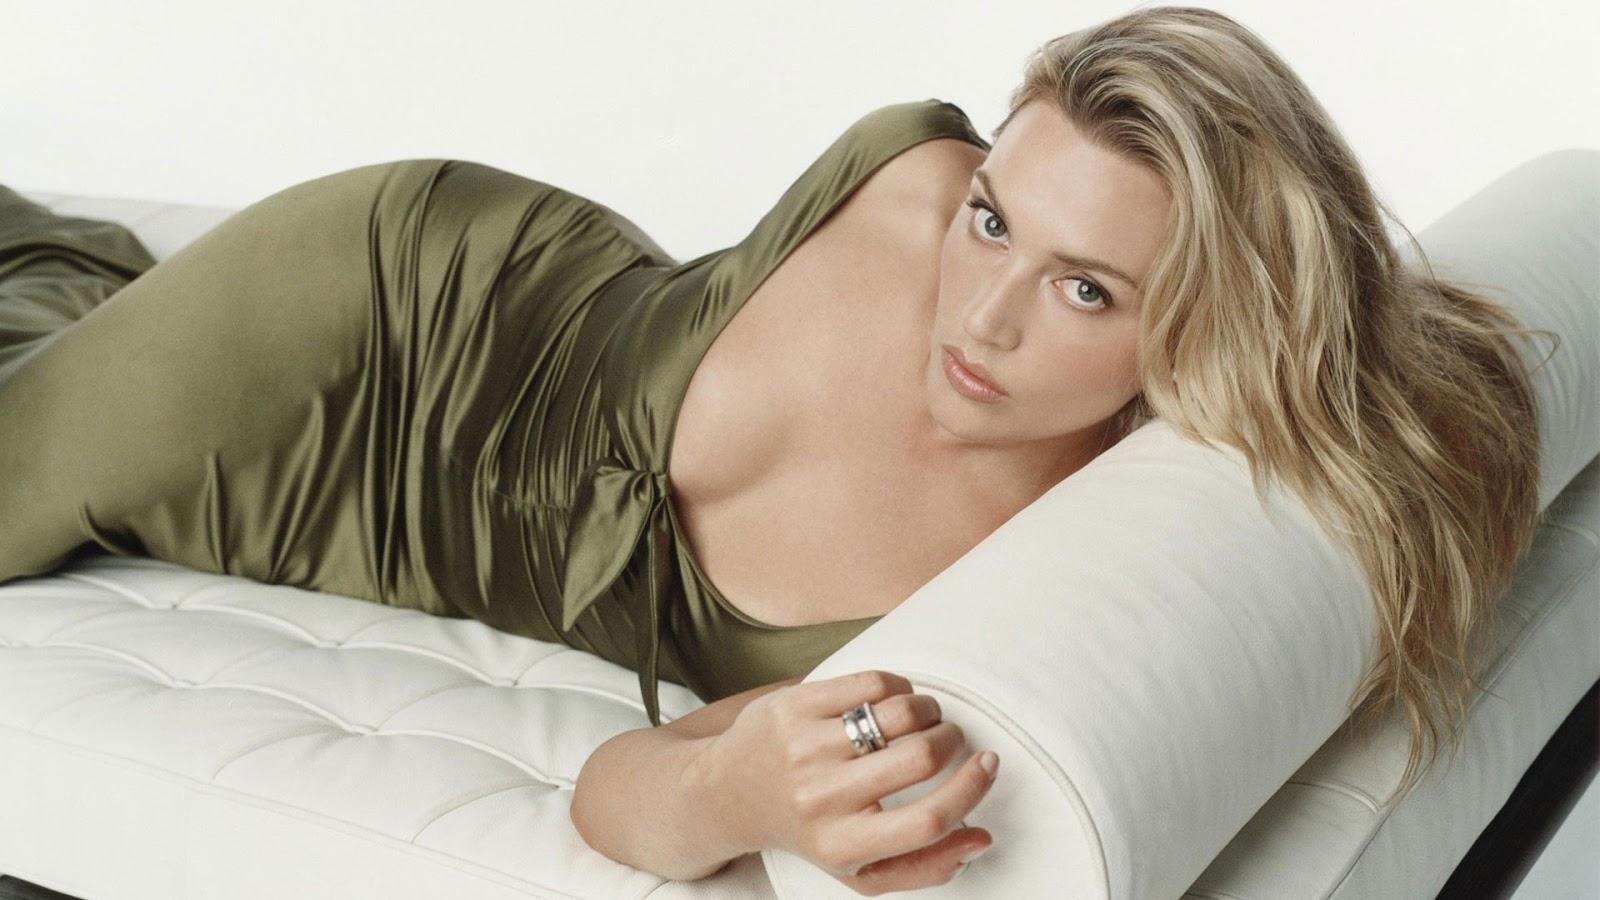 Kate Winslet photos hair Кейт Уинслет фото волосы